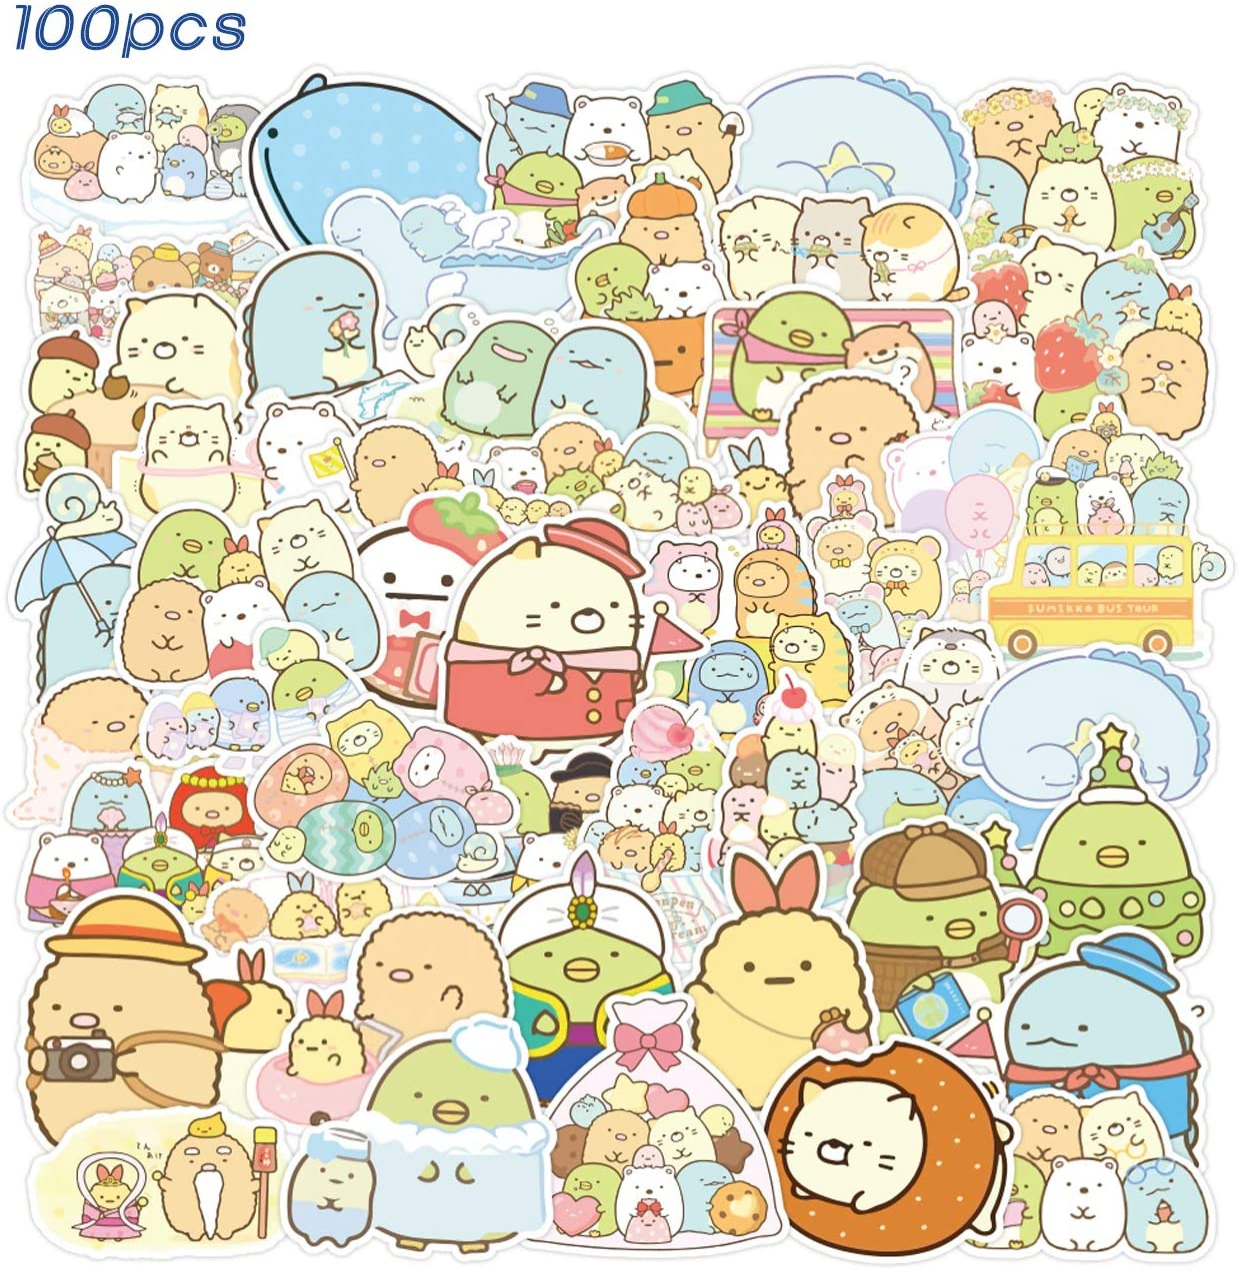 SPIRO 100pcs Sumikk_o Gurashi Sticker Cute Cartoon Stickers Vinyl Waterproof Stickers for Kids Teens Adults Laptop Water Bottles Skateboard Birthday Party Supplies